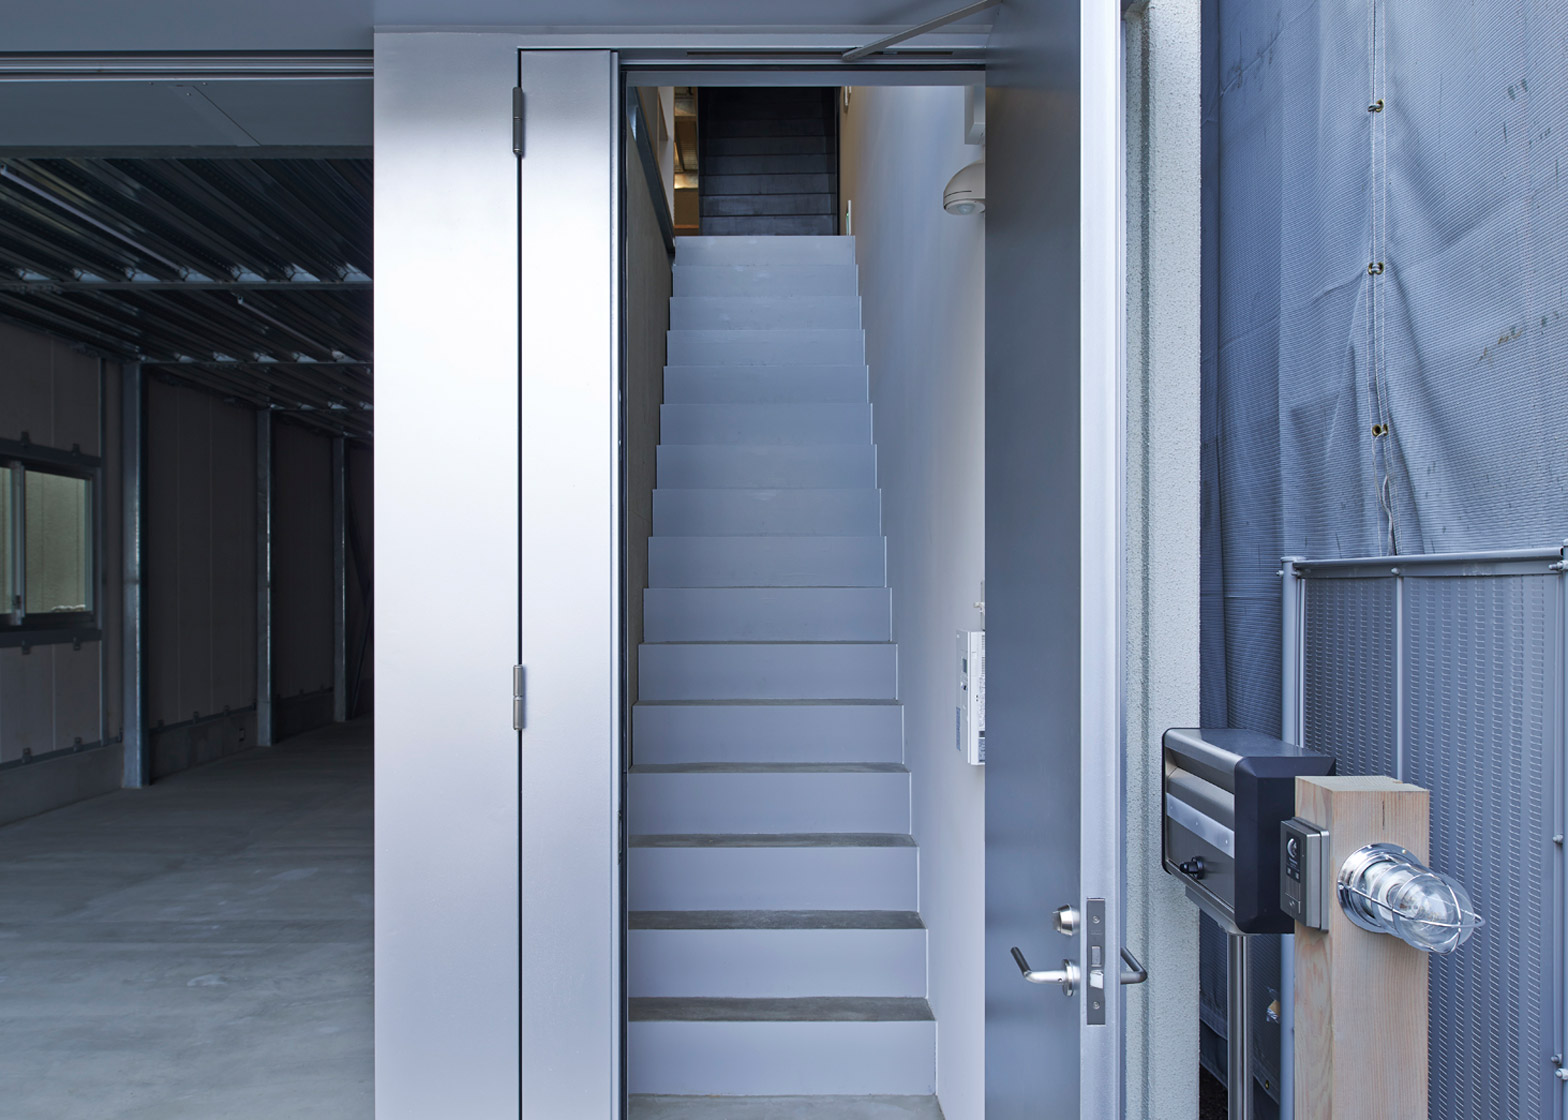 Ninkipen! wedges galvanised metal office for a construction firm between Tokyo blocks